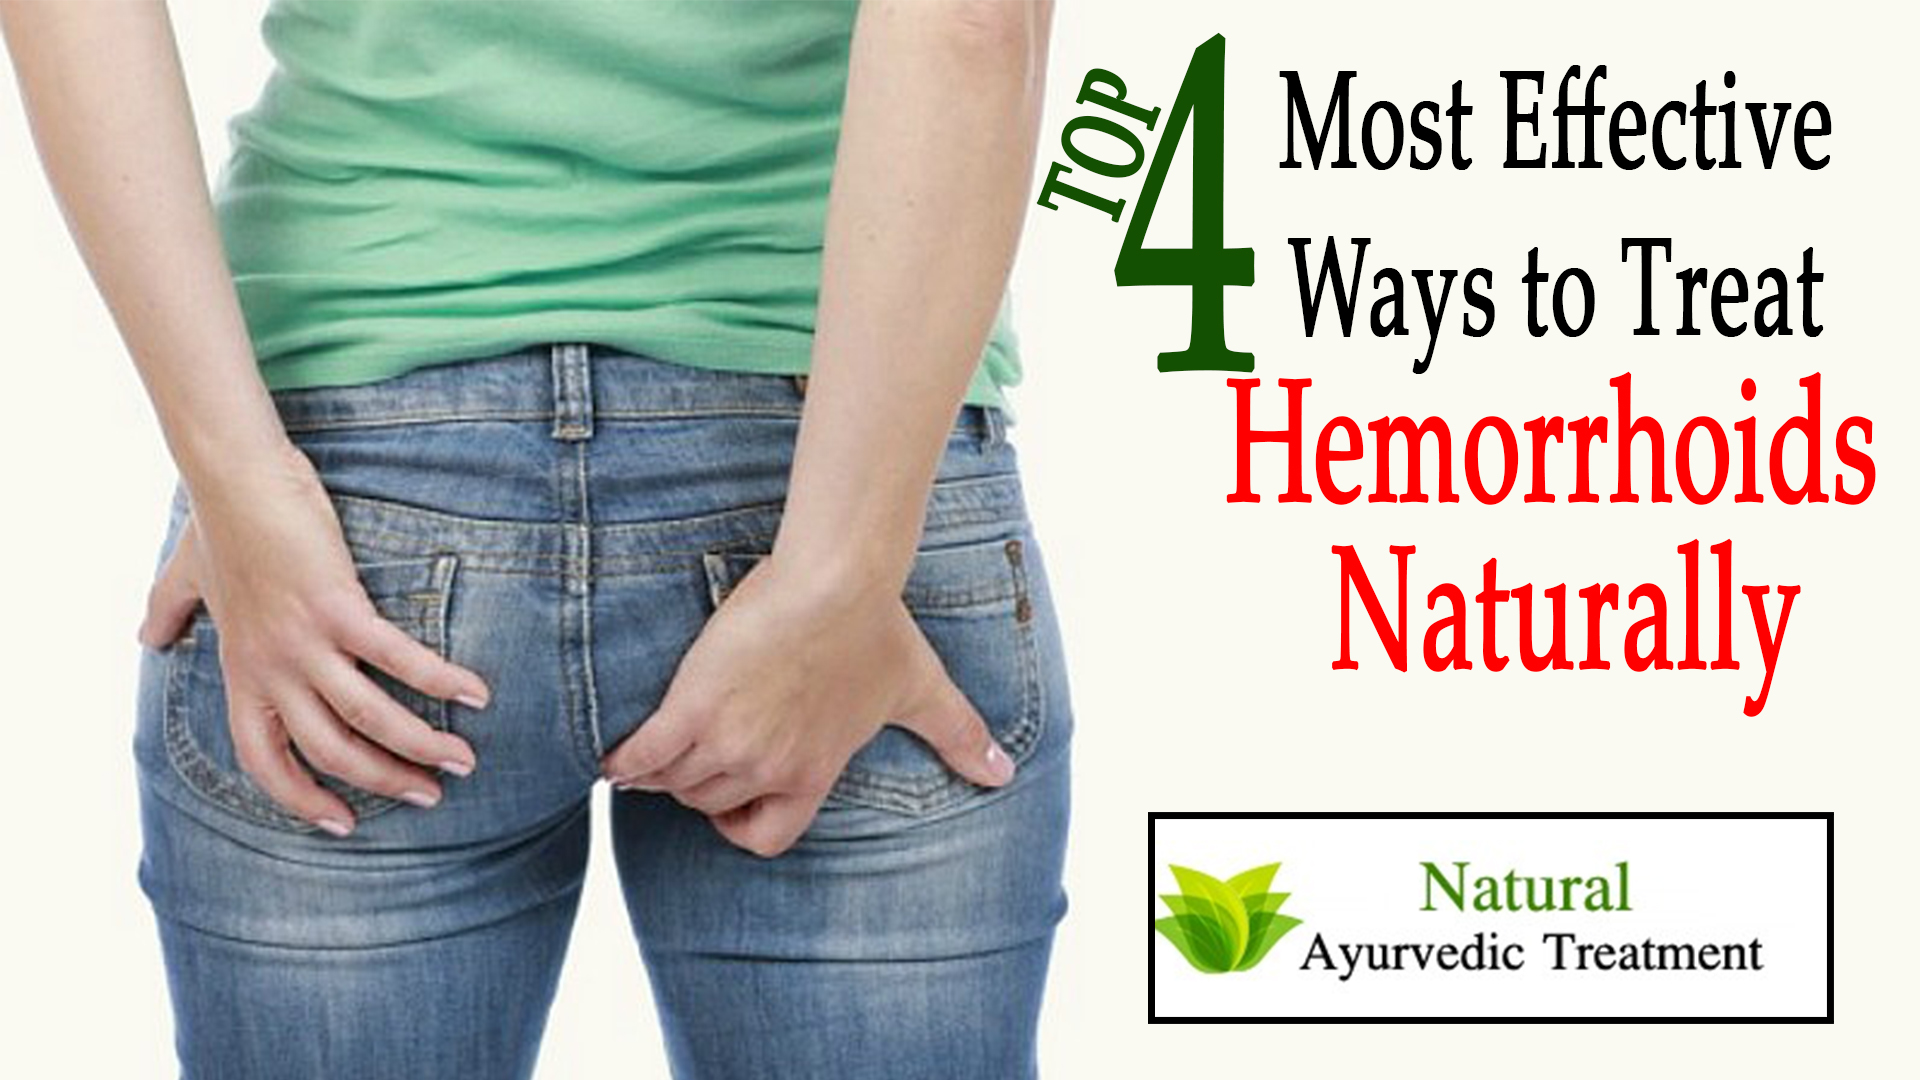 Top 4 Most Effective Ways to Treat Hemorrhoids Naturally